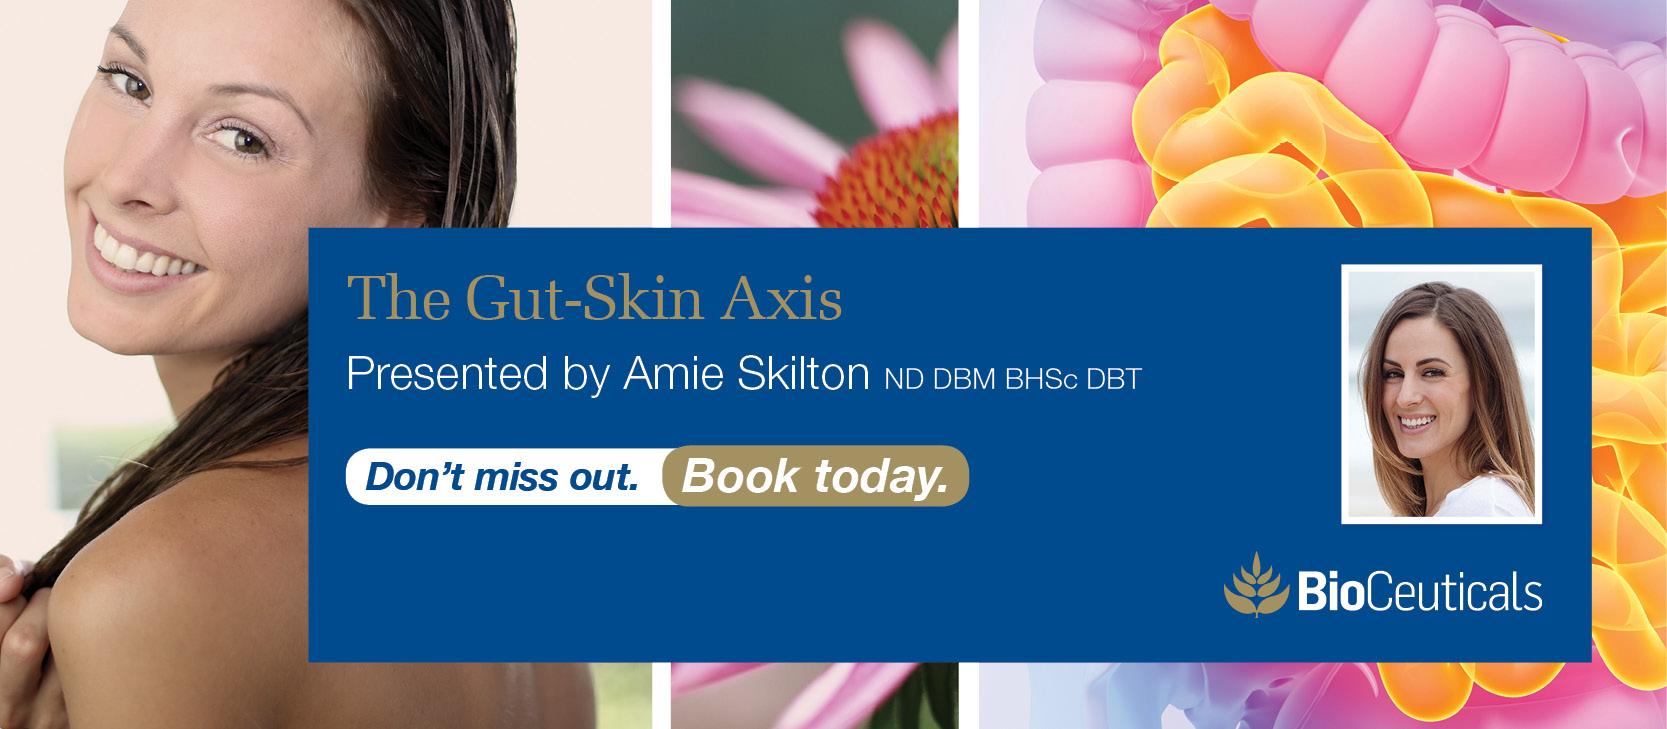 The Gut-Skin Axis - Perth